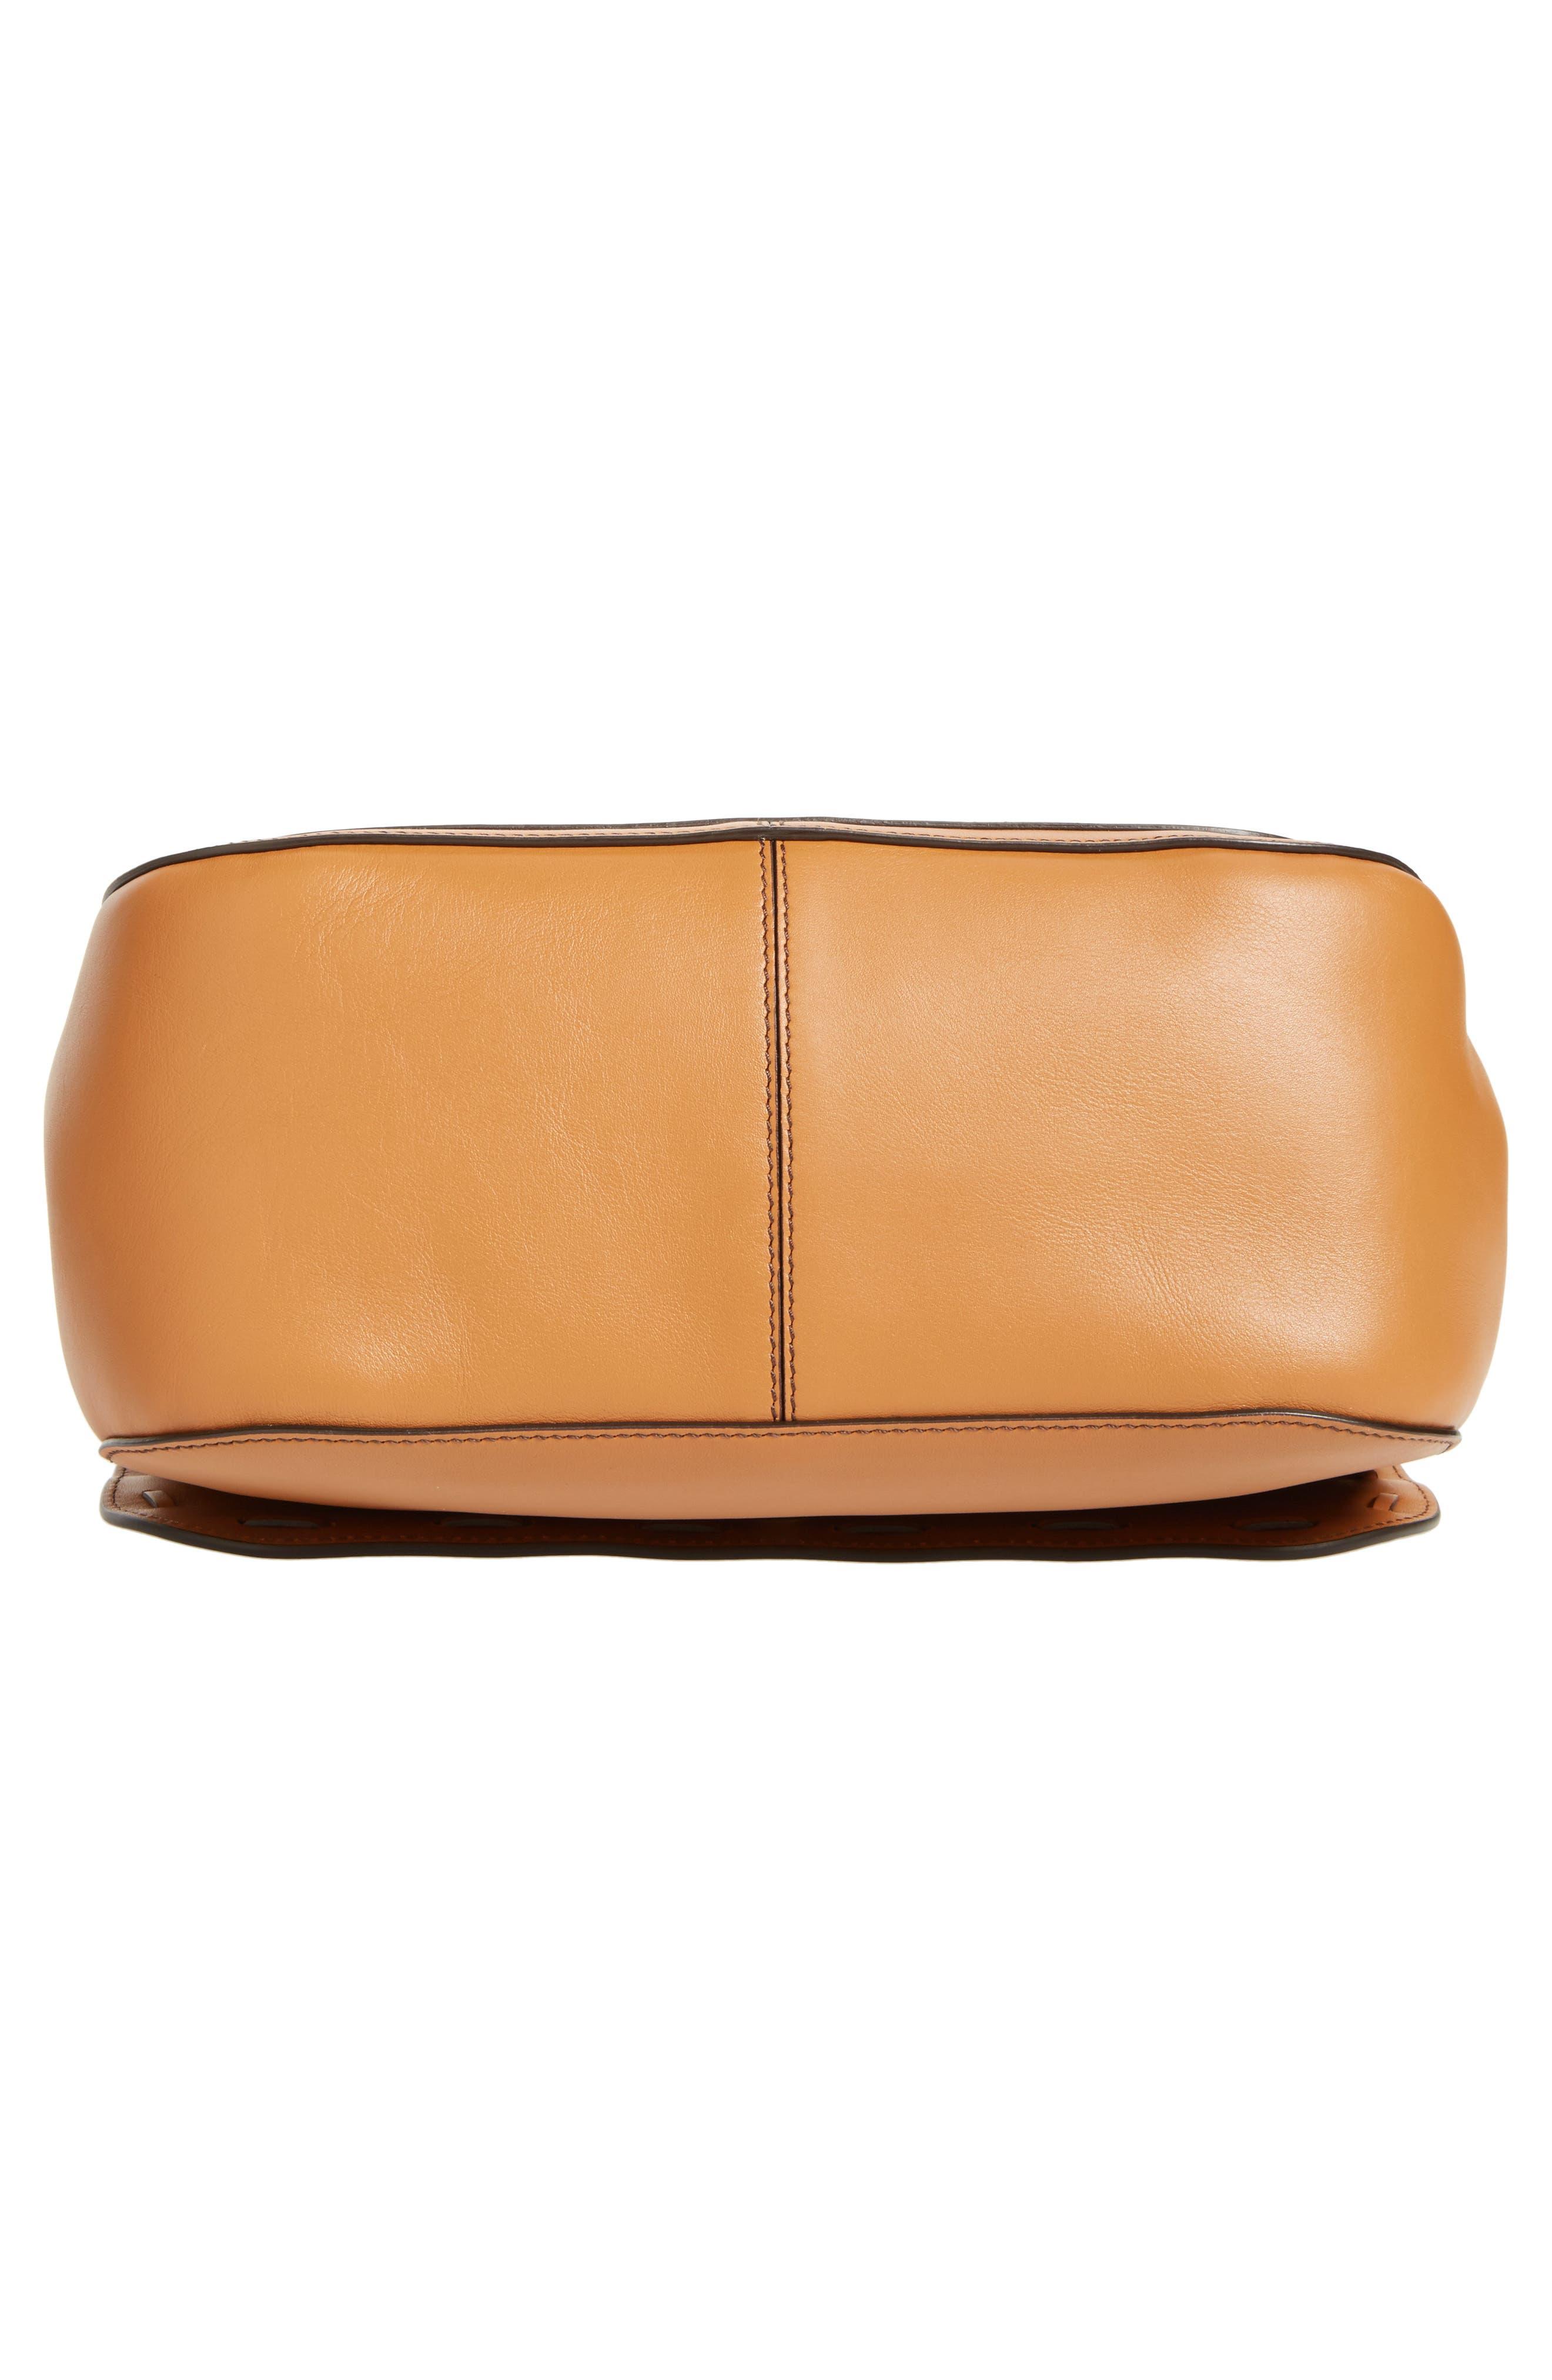 BoBag Leather Satchel,                             Alternate thumbnail 17, color,